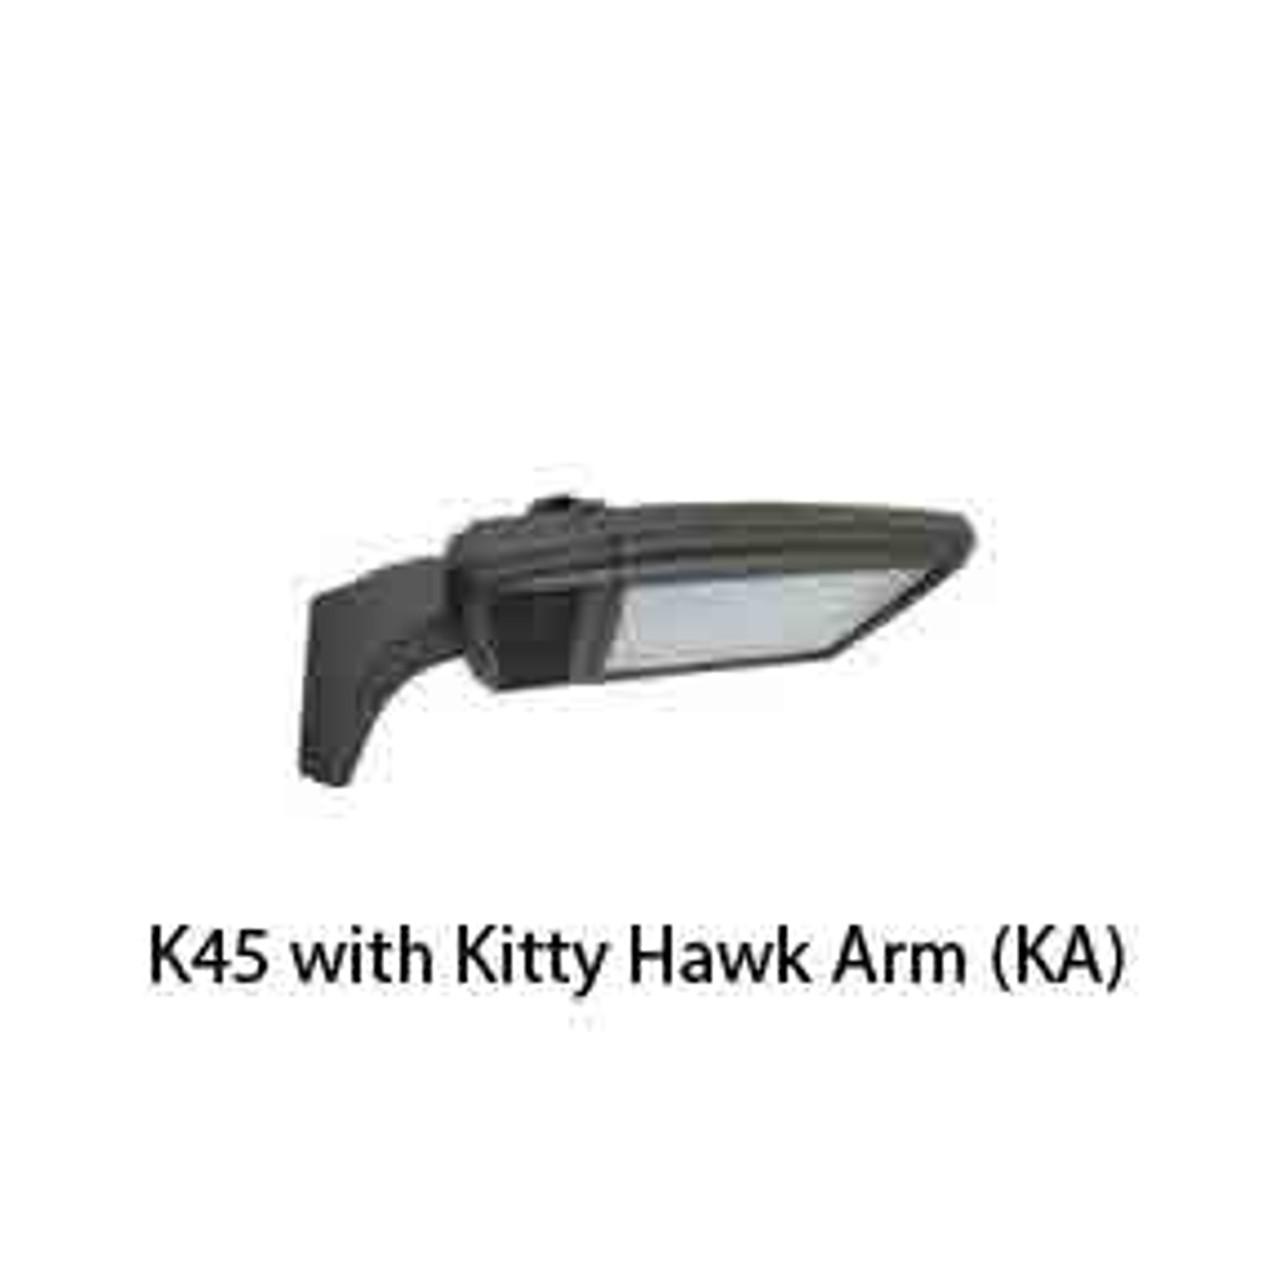 K45 with Kitty Hawk Arm (KA)